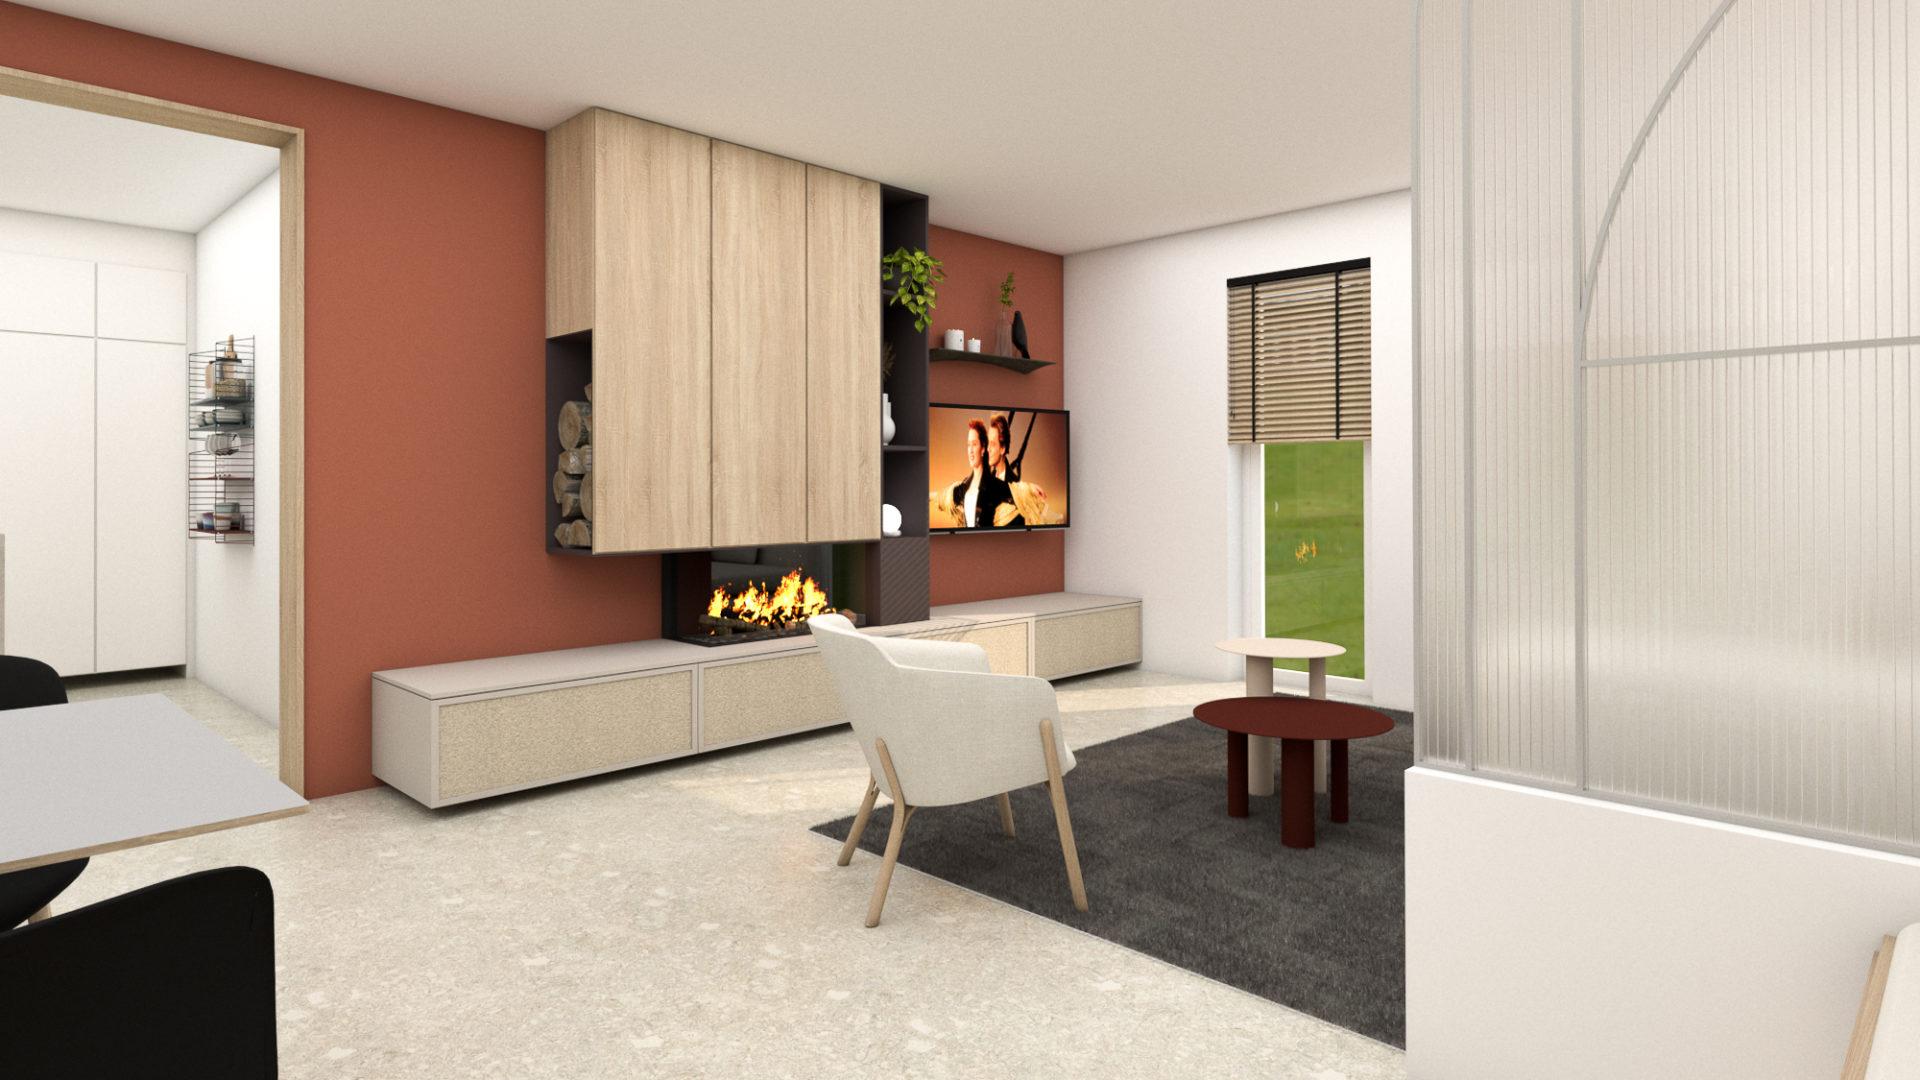 Maison Aubel - rendu meuble TV insert terracotta